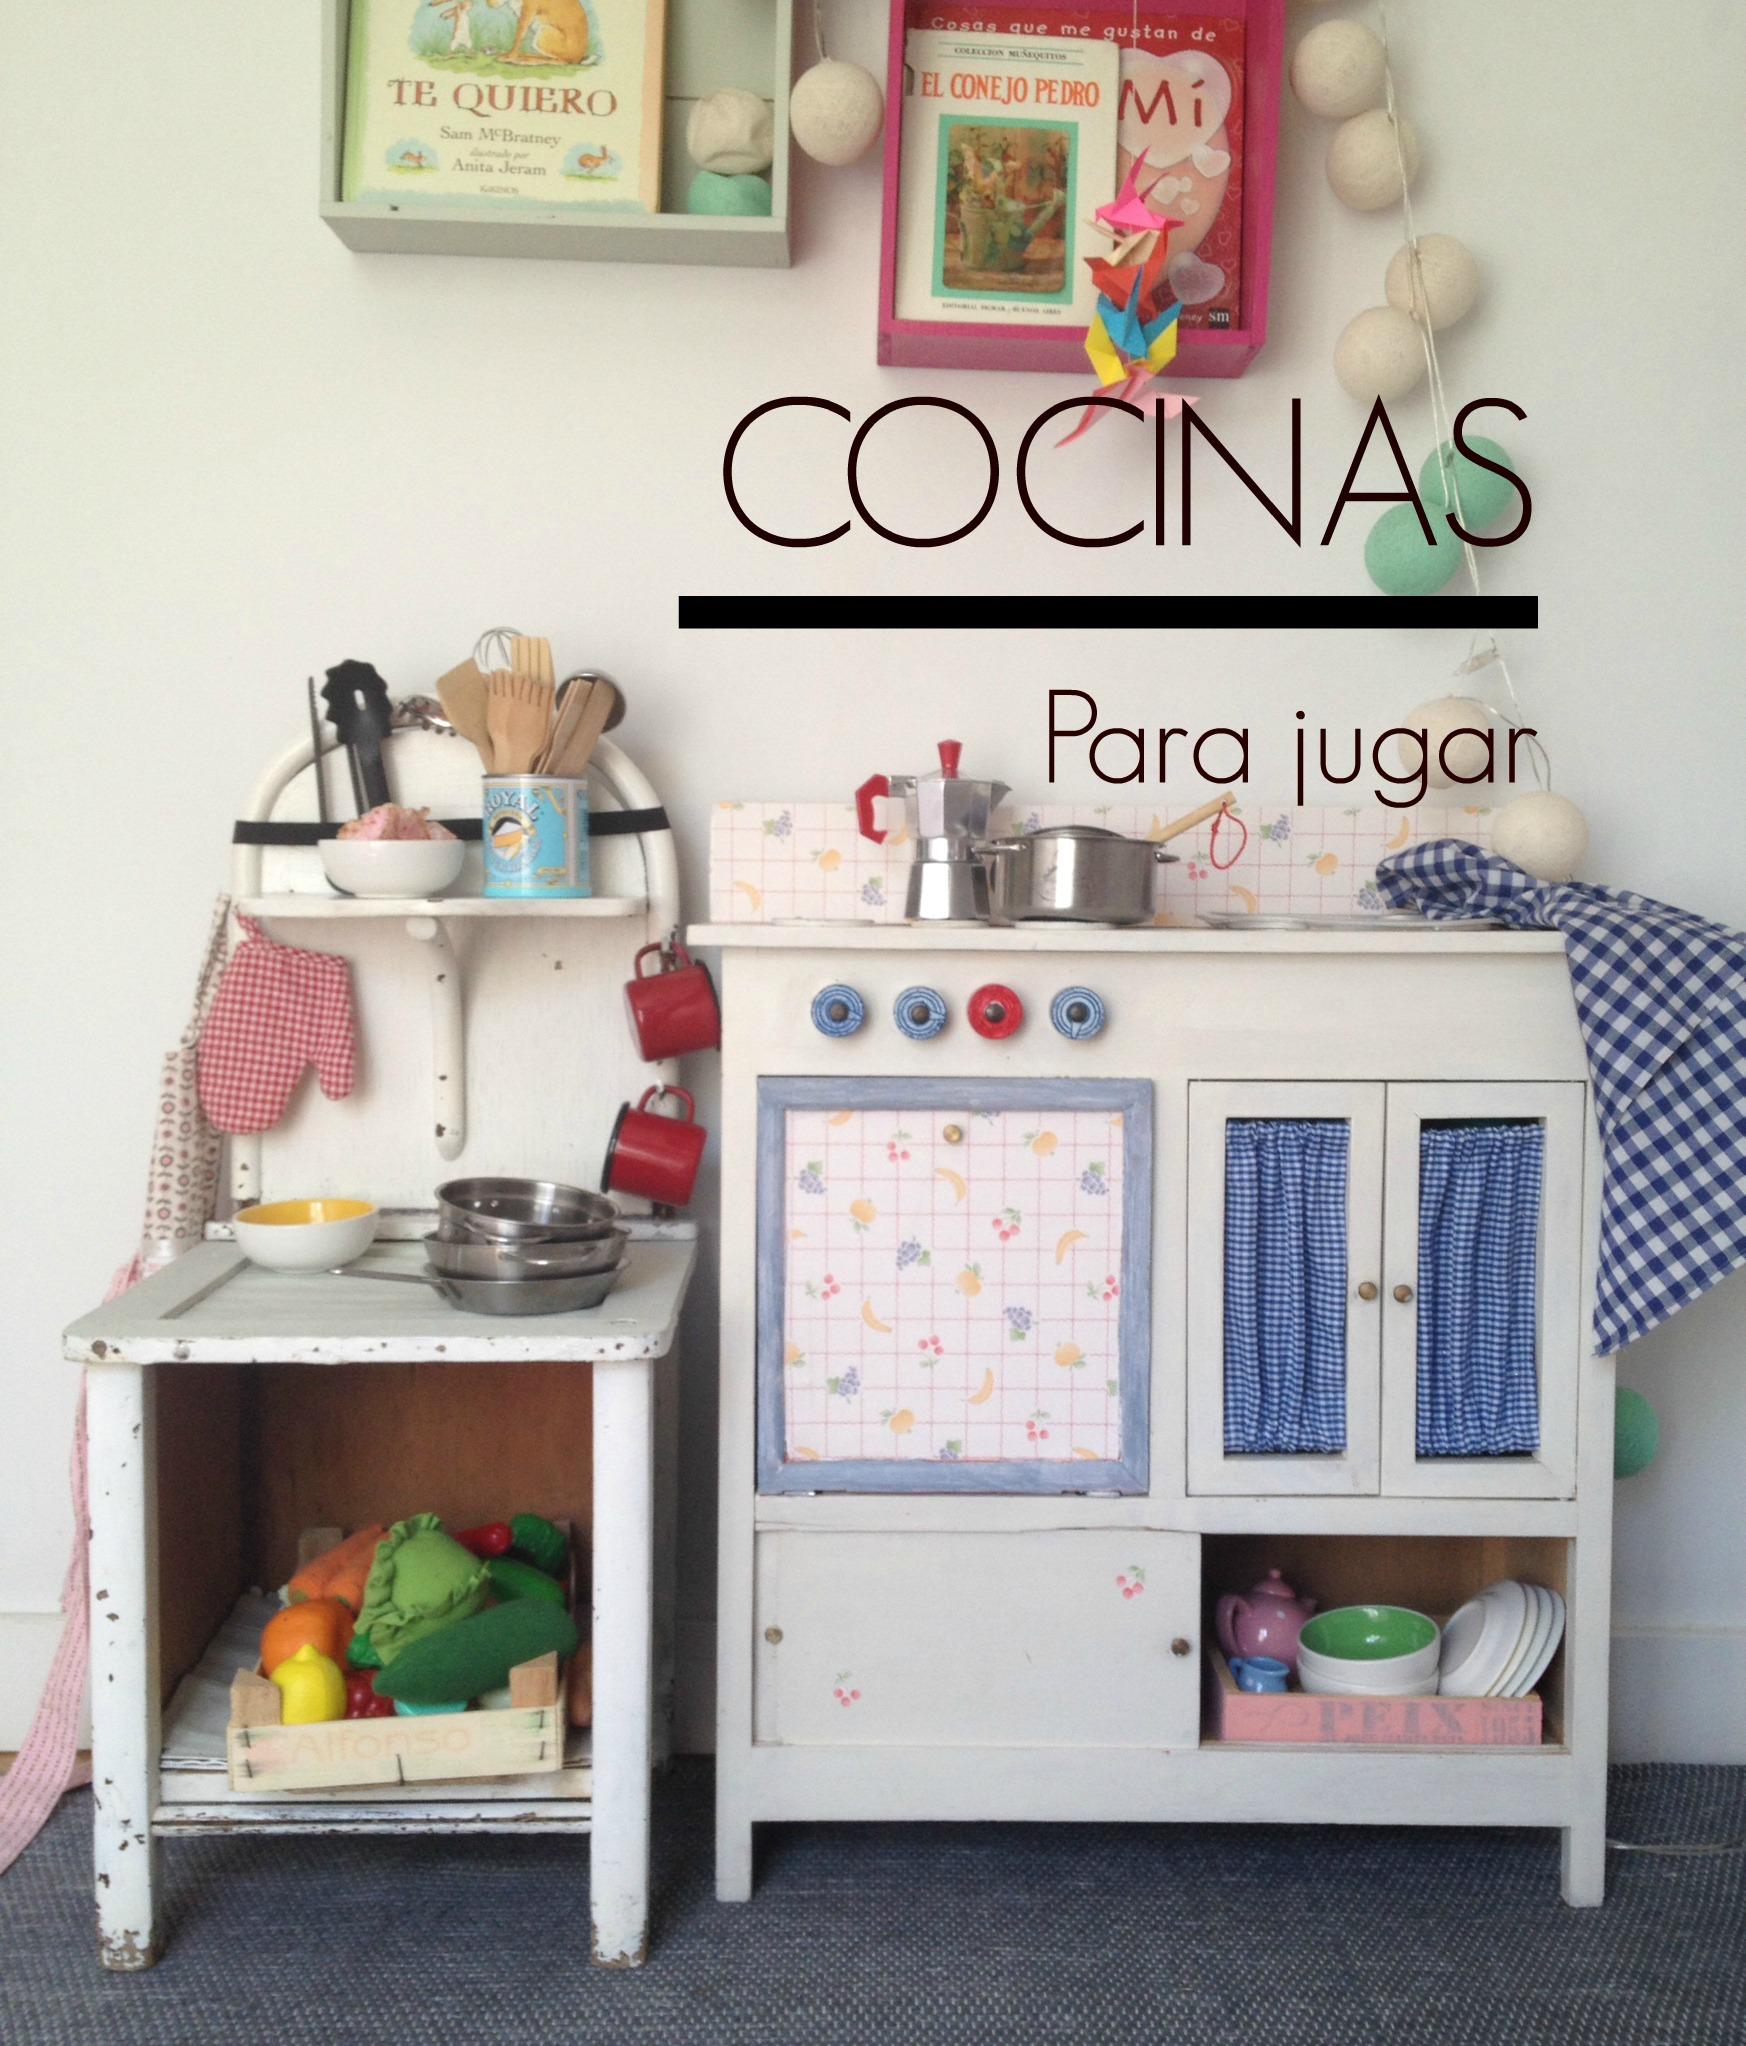 Cocinitas pepitaliving for Cocina juguete segunda mano